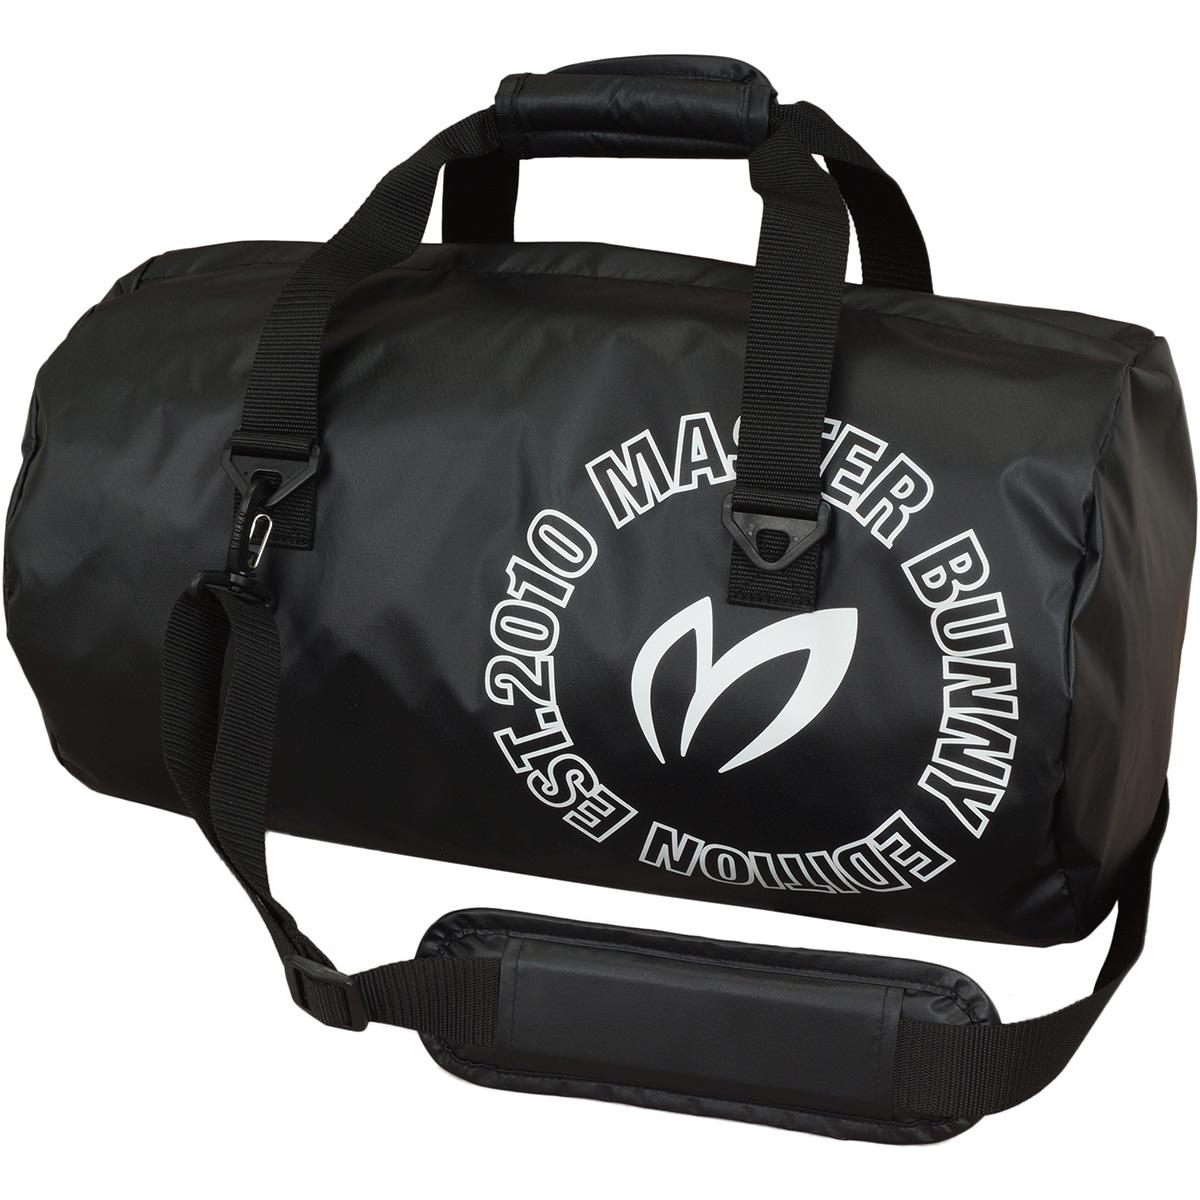 10thサークルロゴ ボストンバッグ